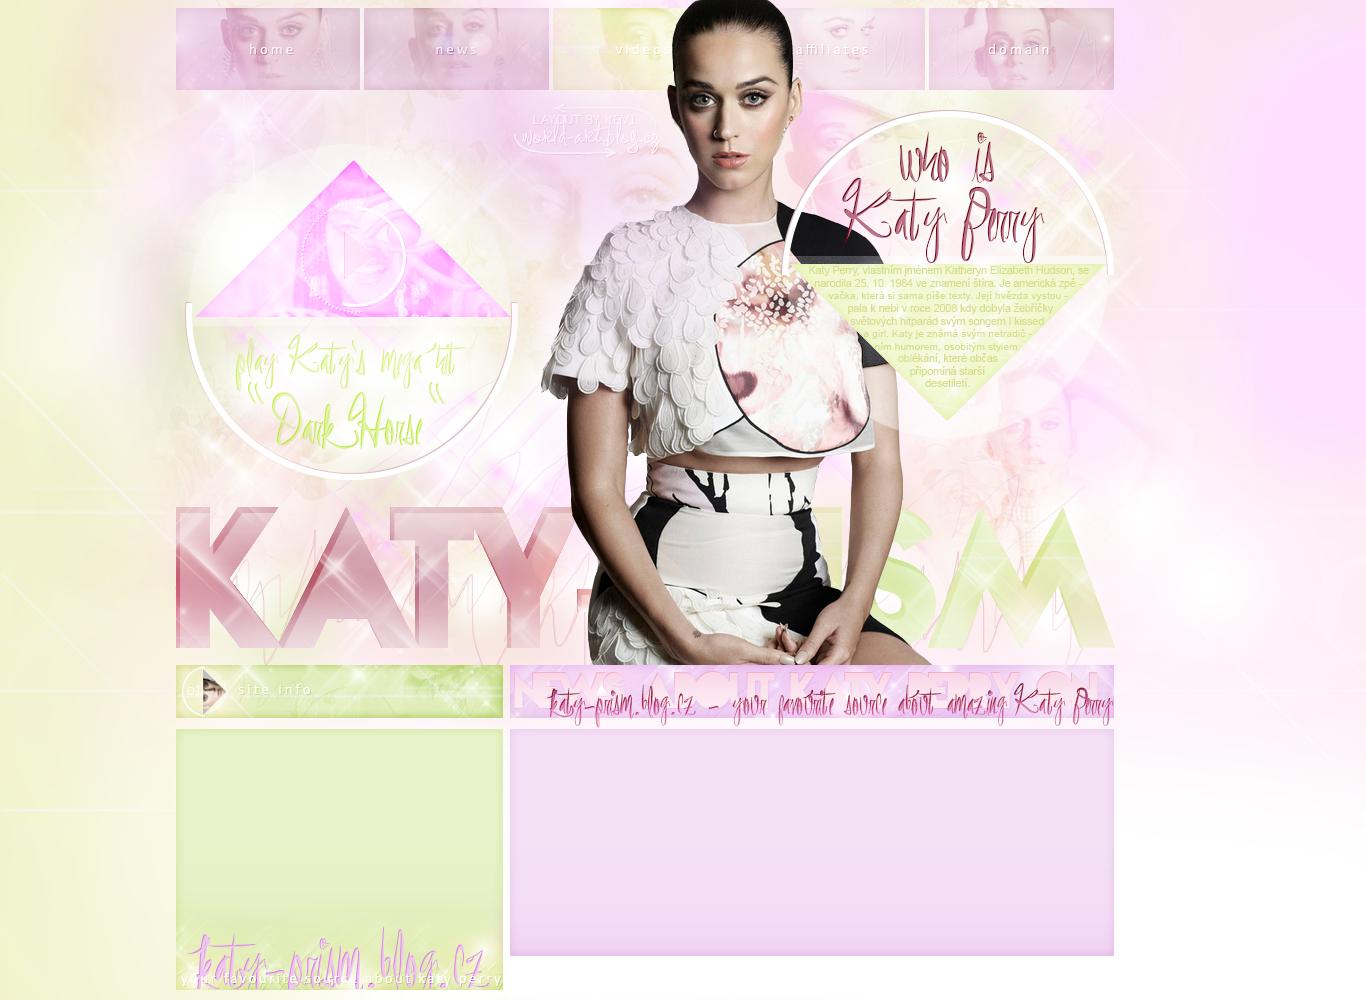 Ordered layout | Katy-prism.blog.cz #3 by KeviWorldArt